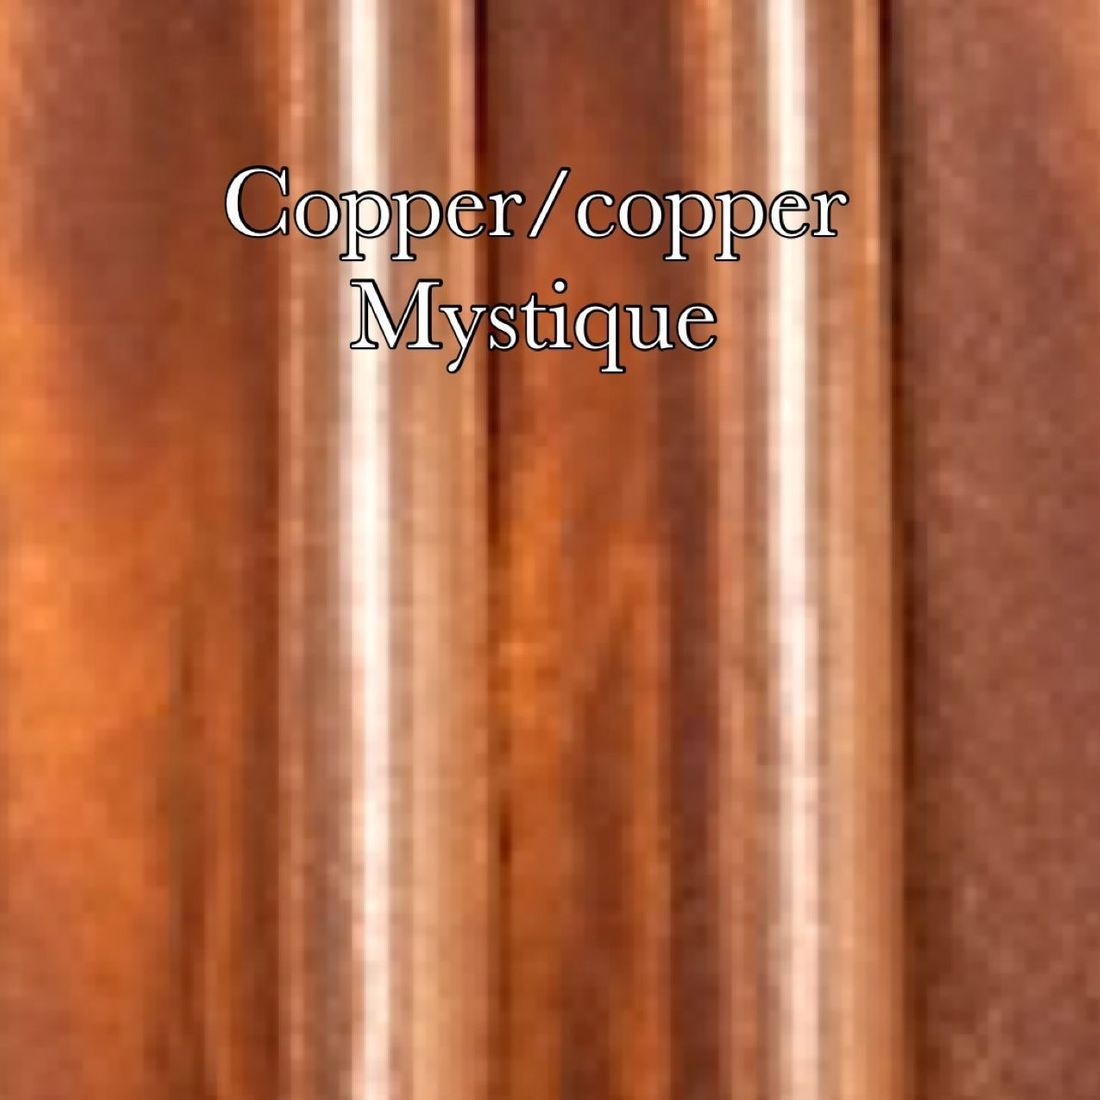 Copper mist